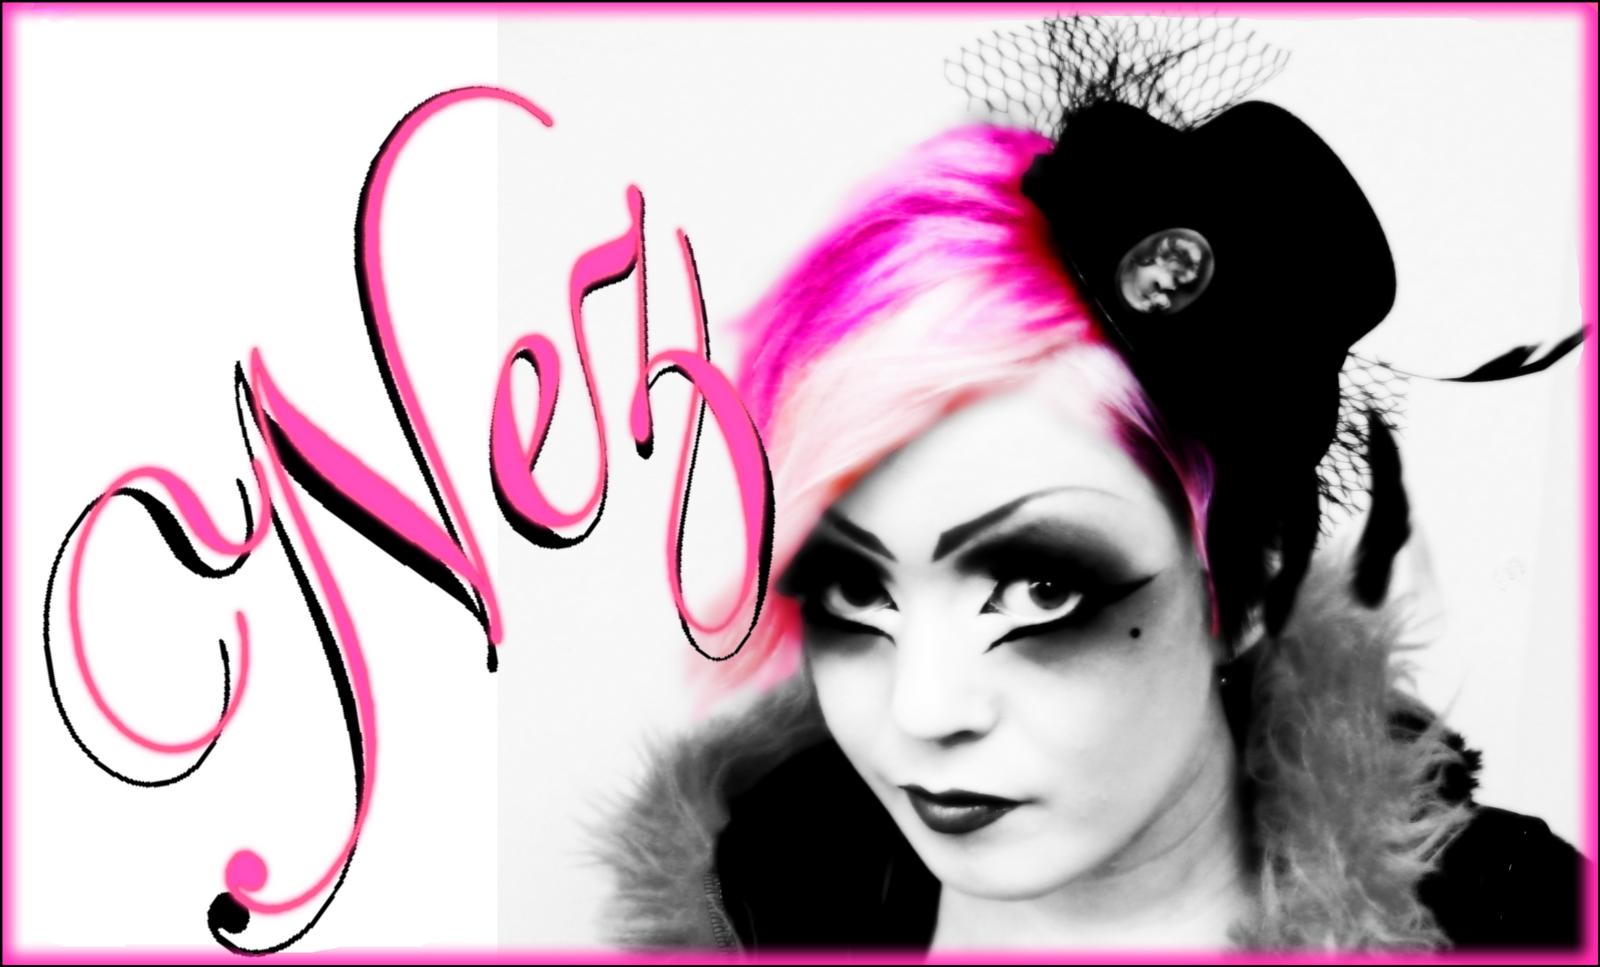 Nea's blog